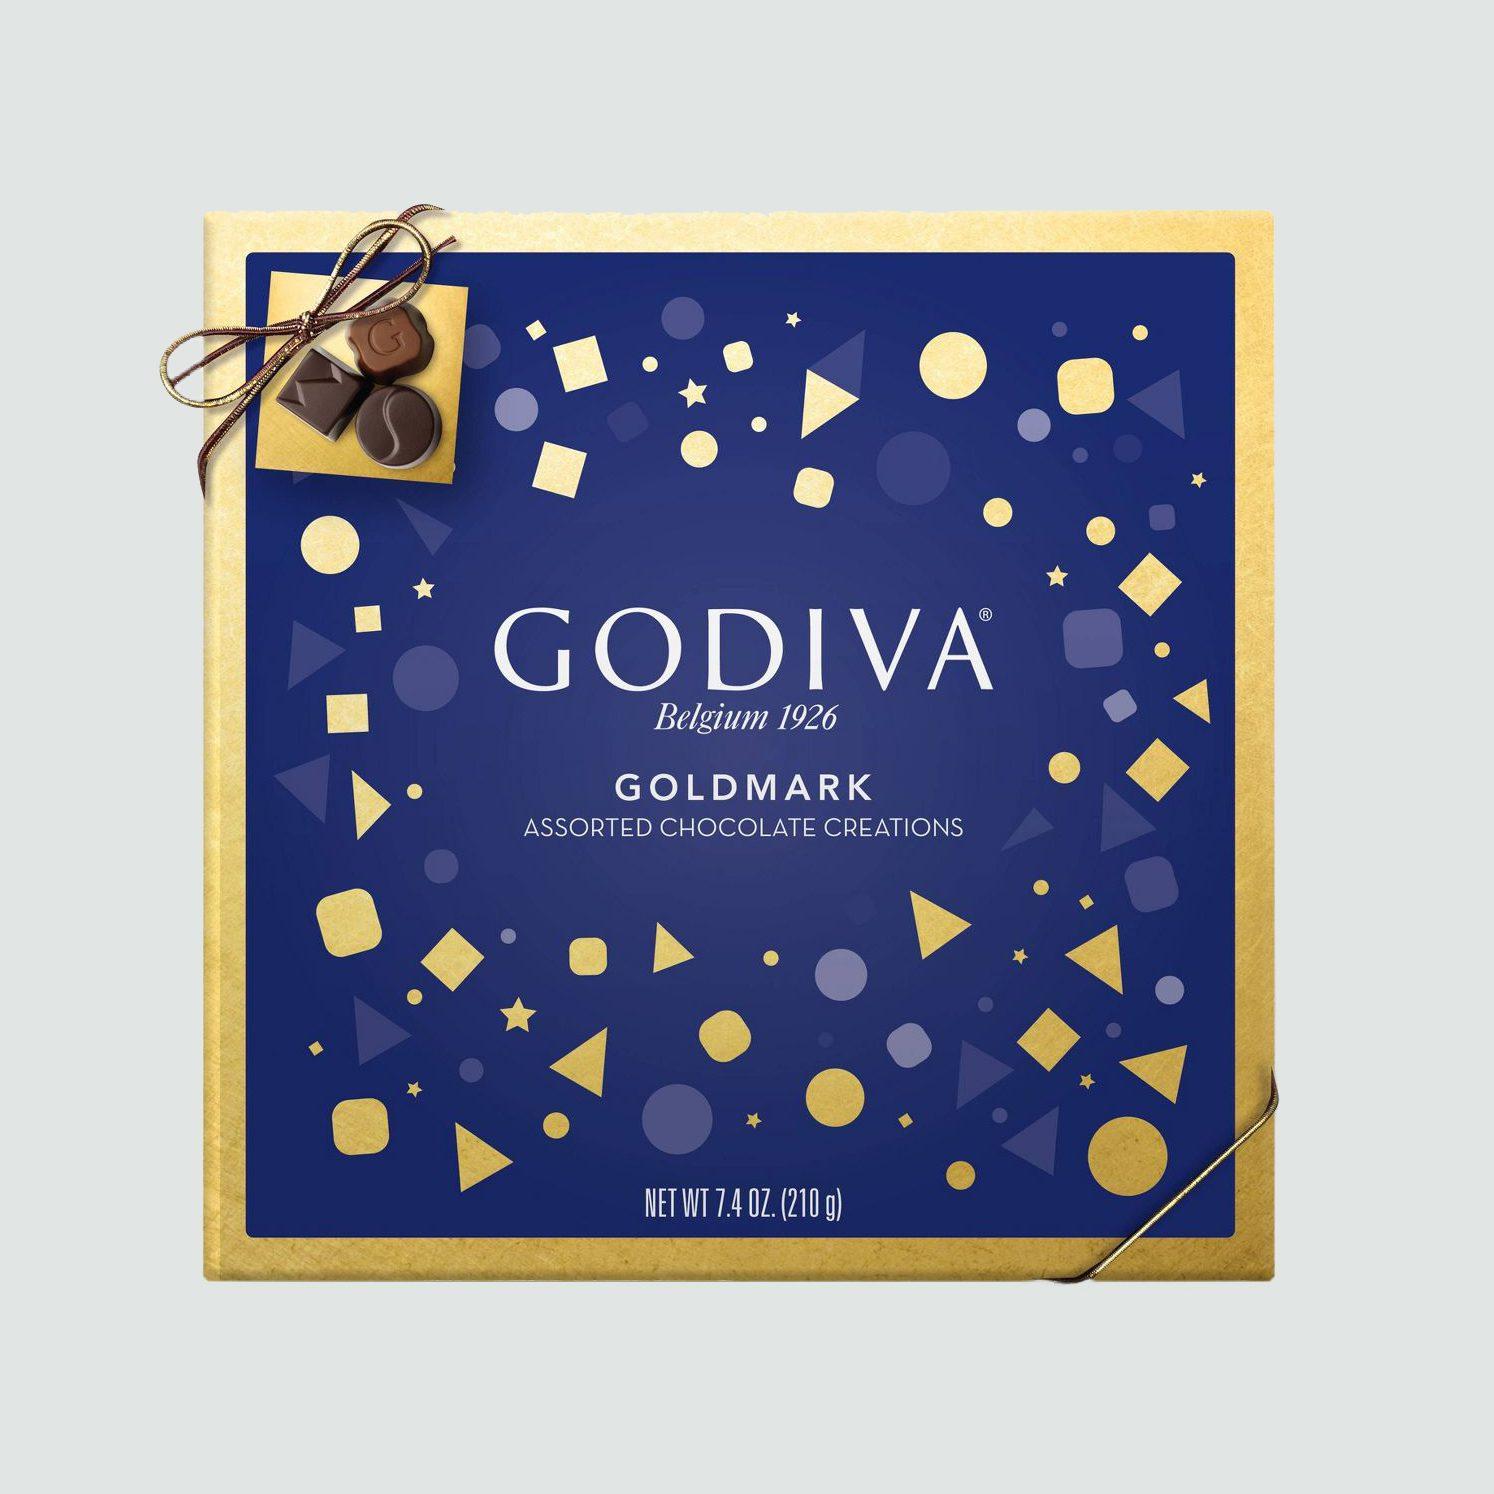 Godiva Goldmark Chocolates